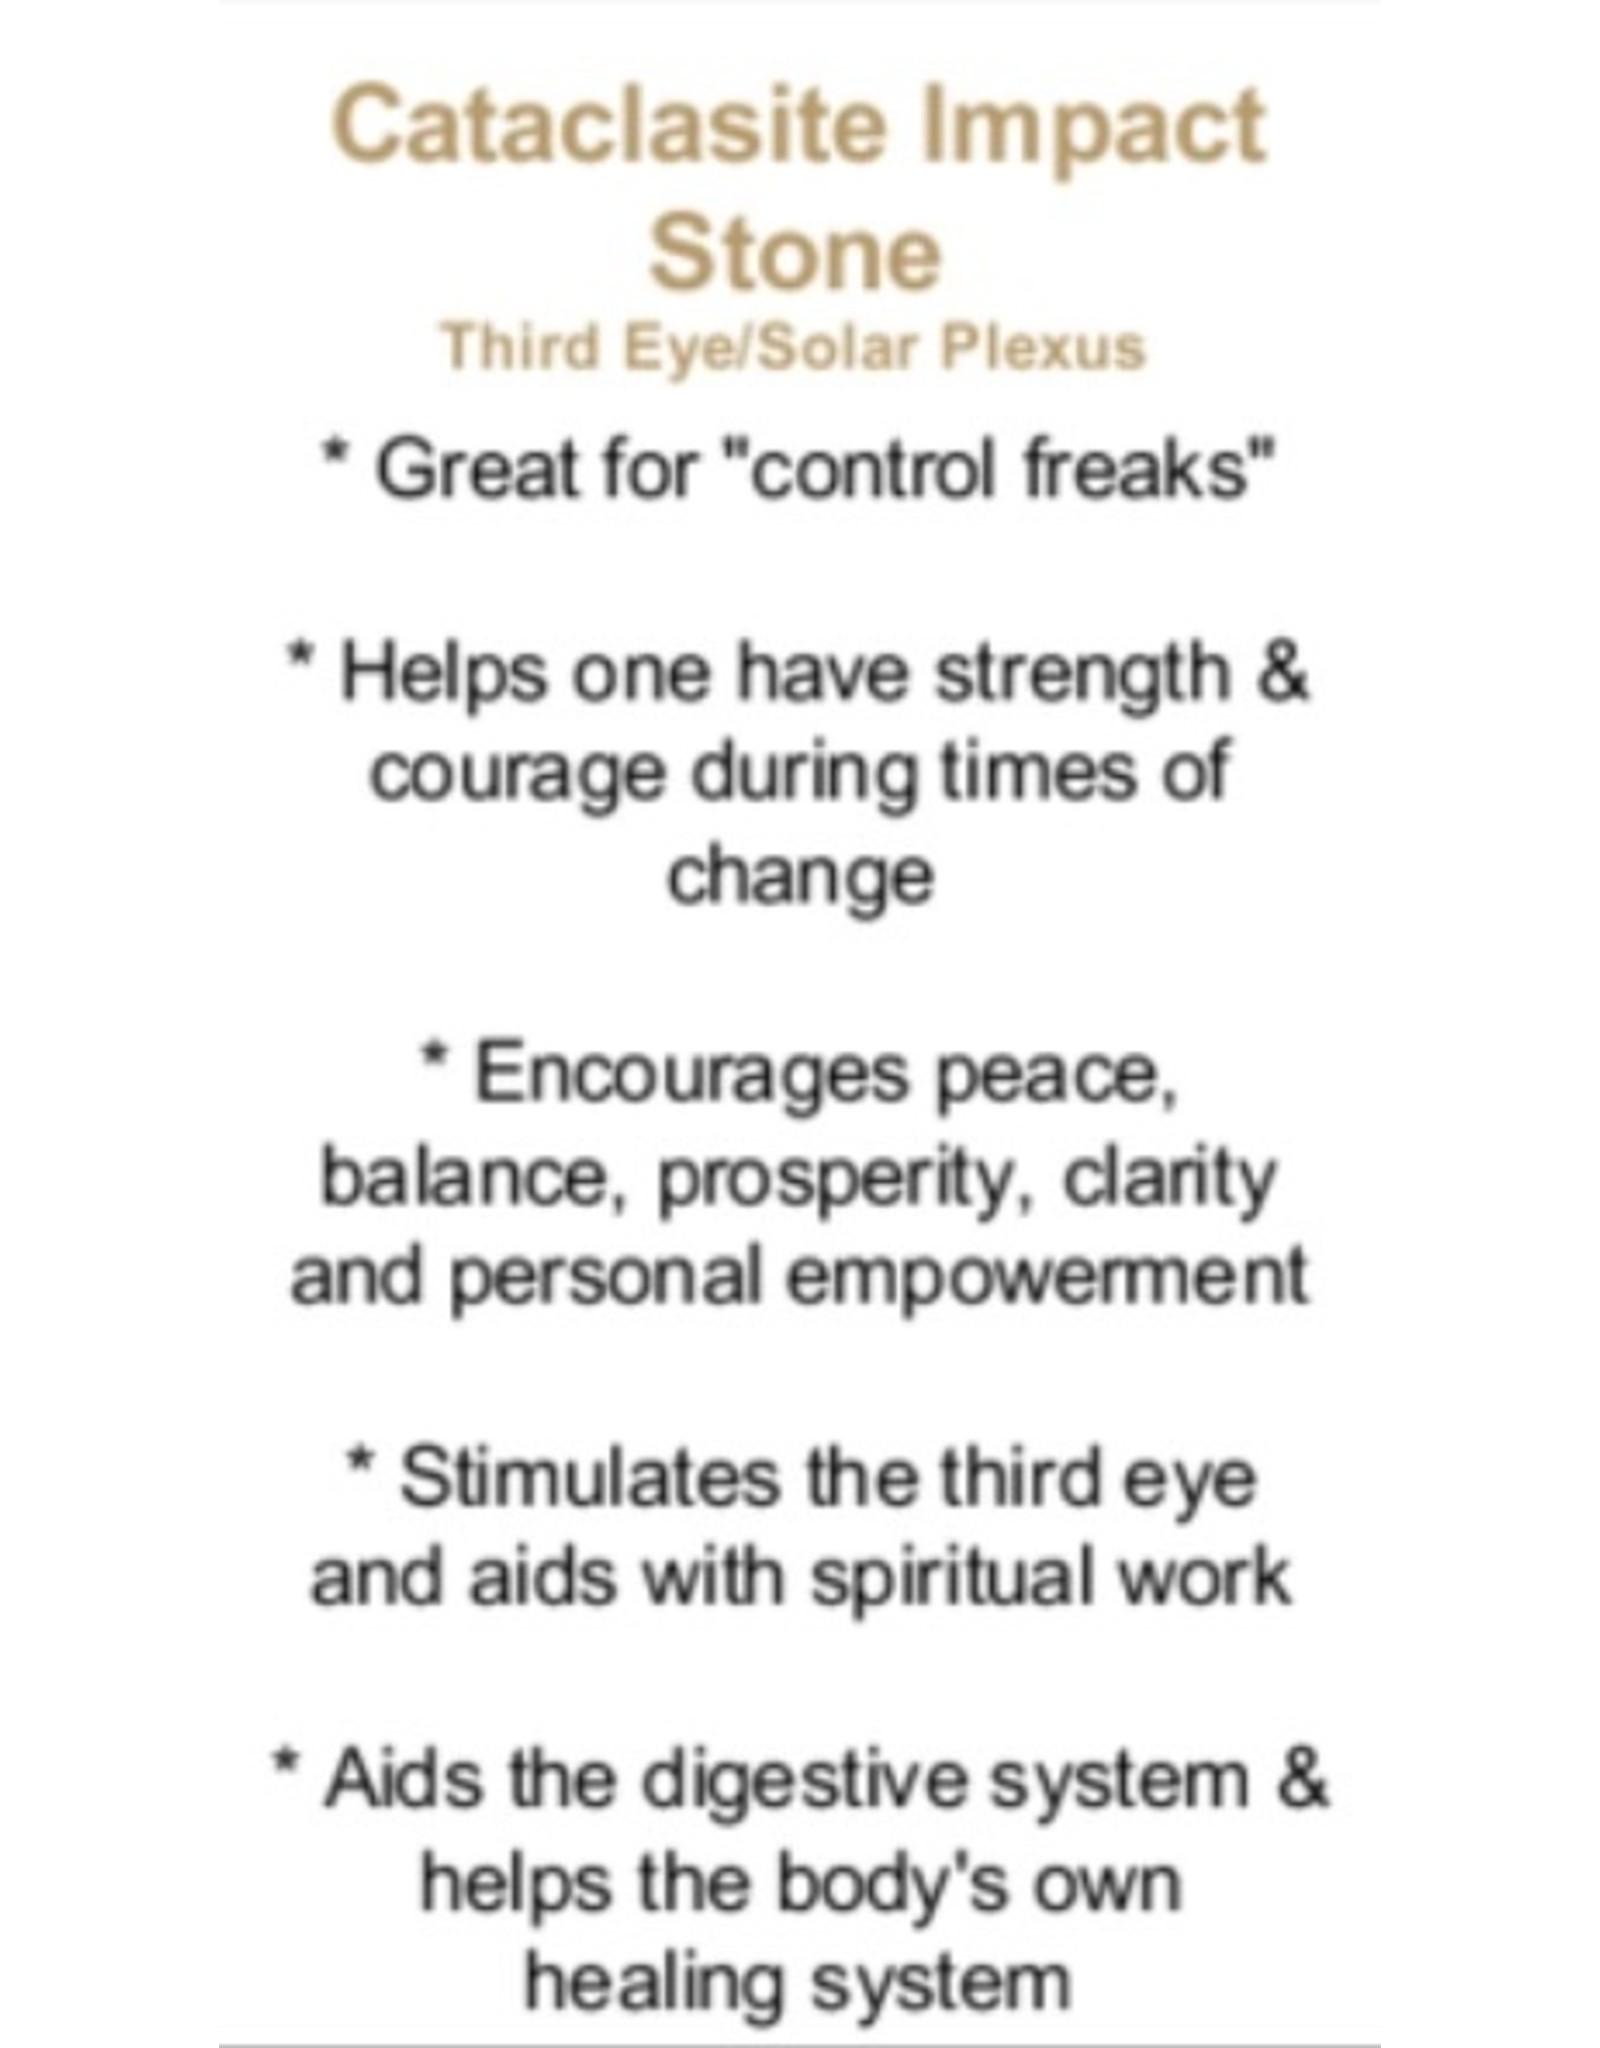 Catacloisite Impact Stone